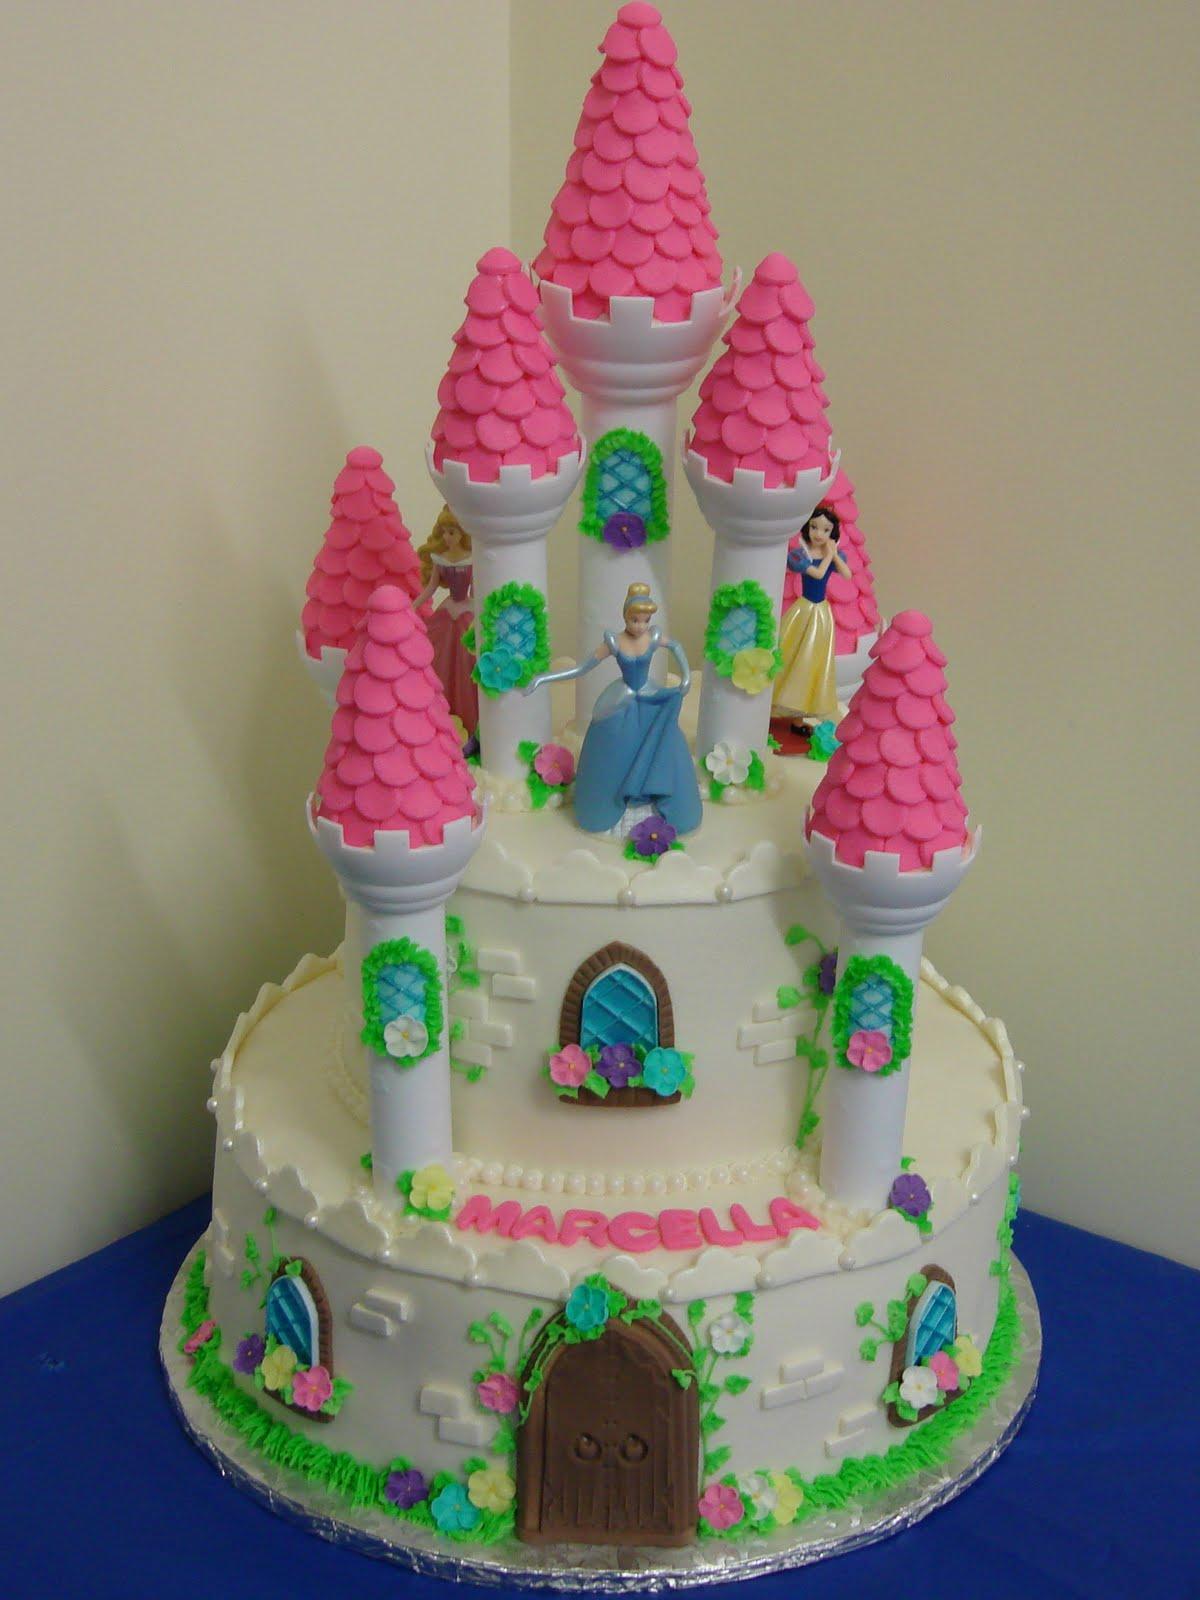 8 Photos of World Disney Princess Cakes